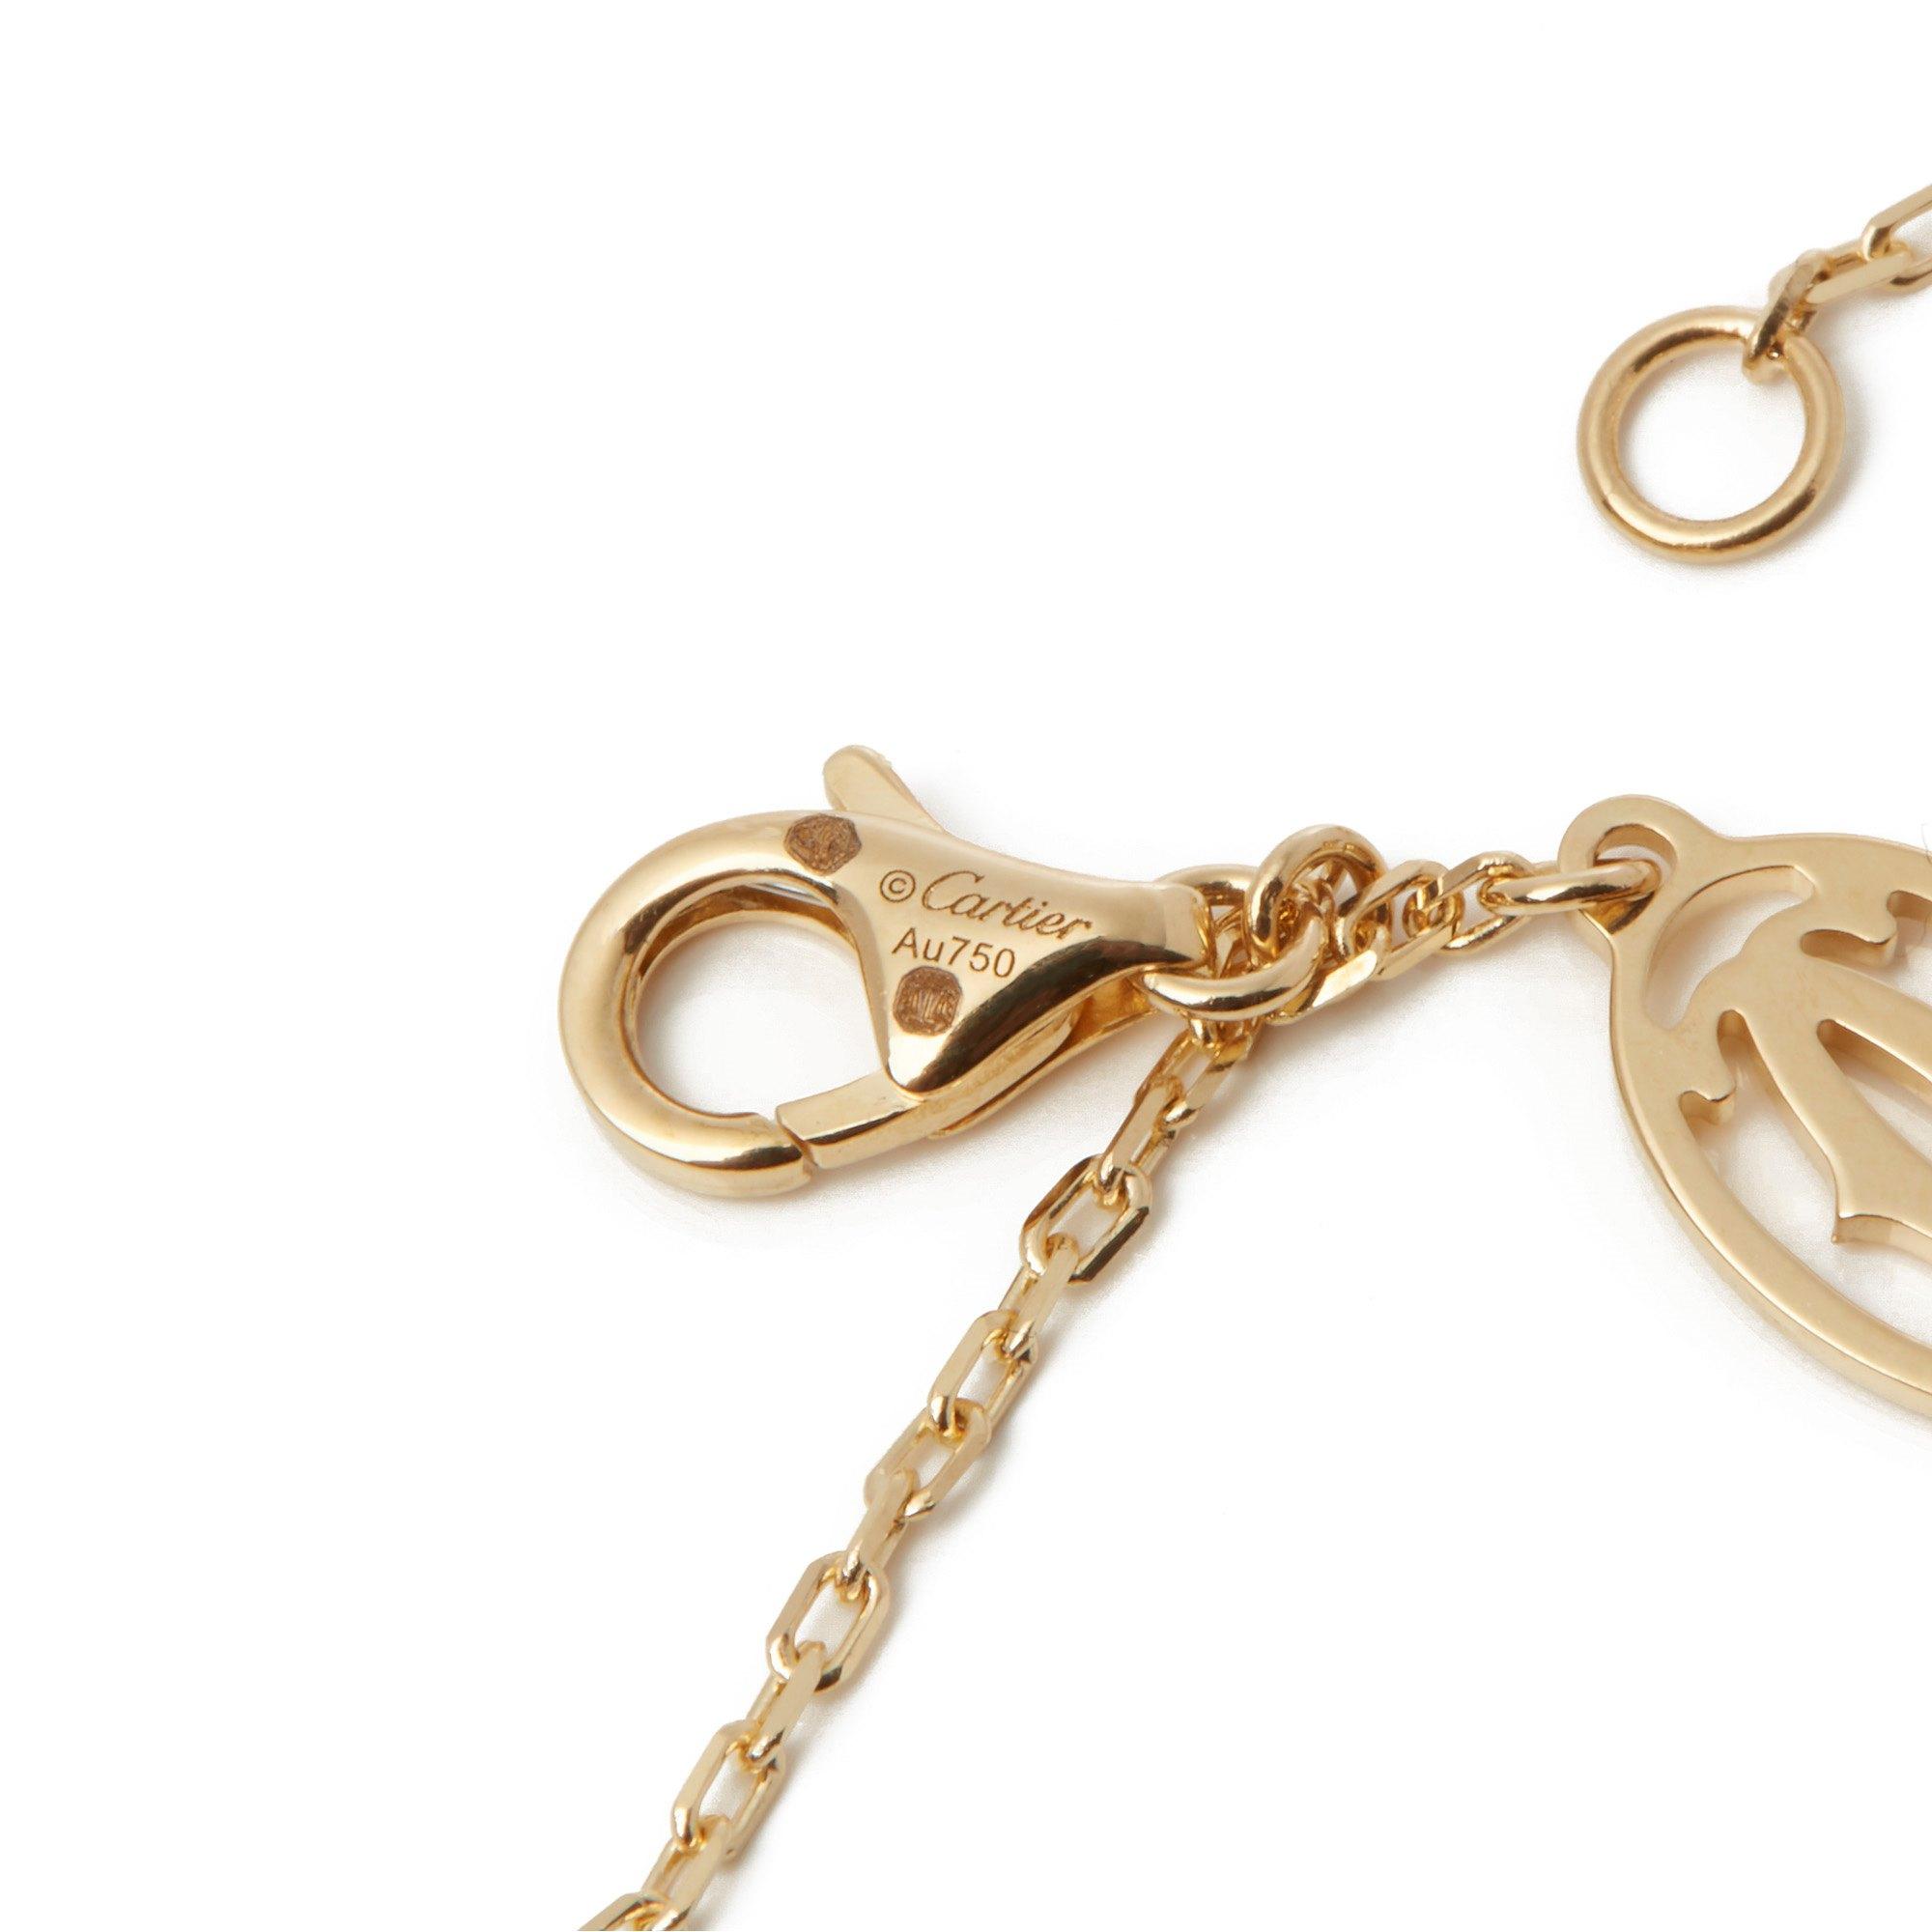 Cartier 18k Yellow Gold Elephant Pendant